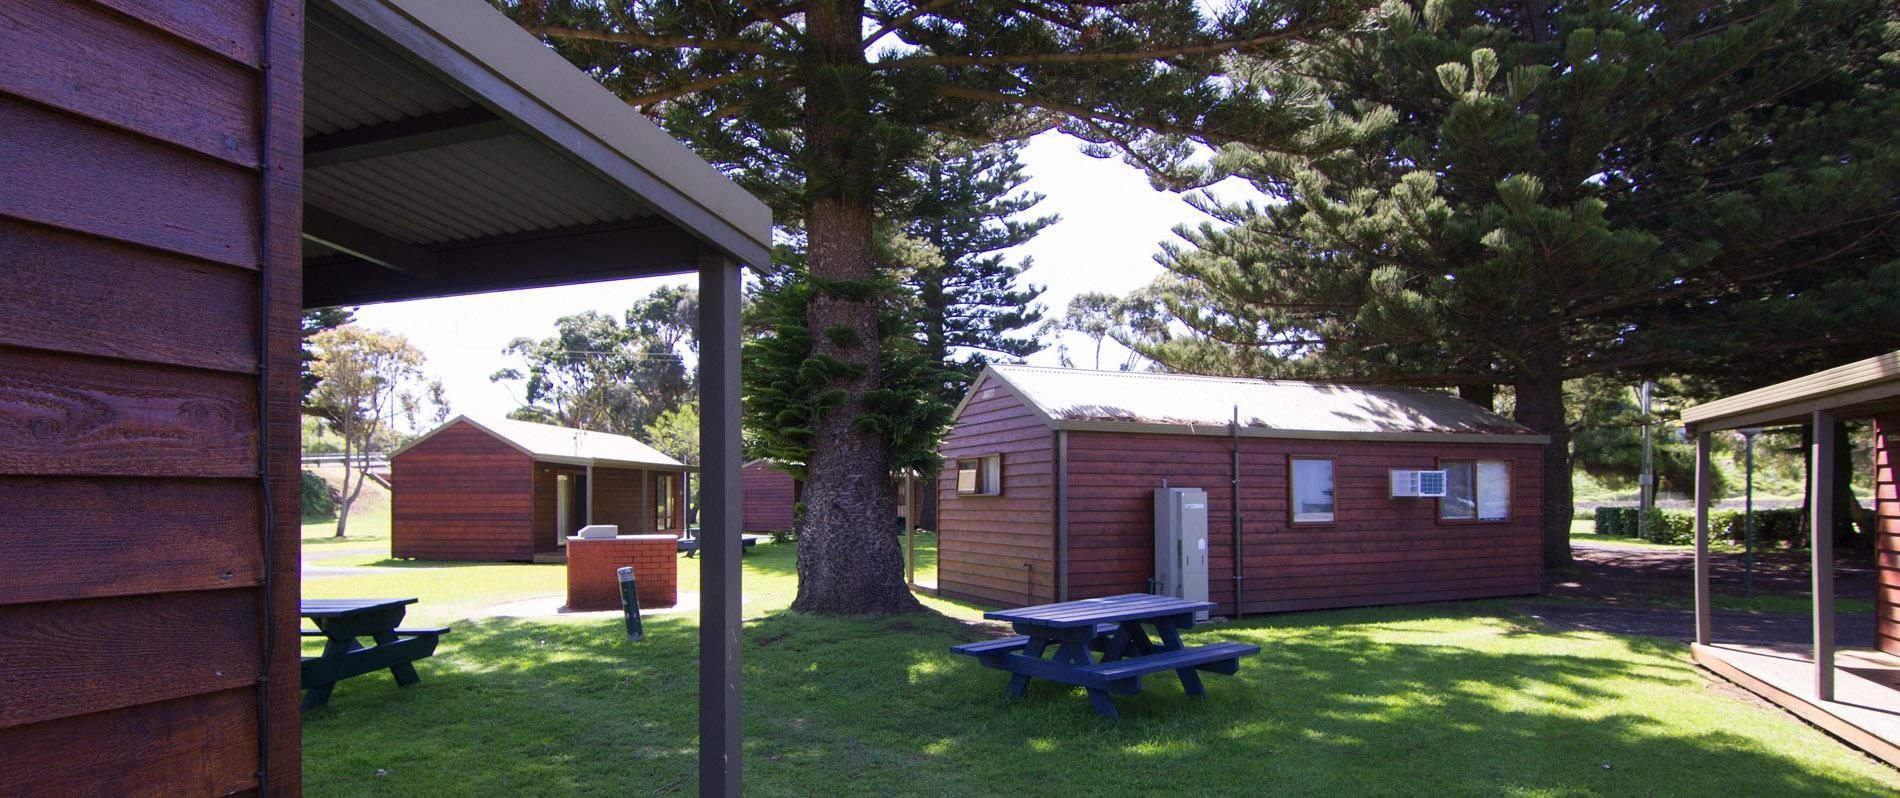 Backyard Cabins Victoria cedar cottages | surfside.warrnambool.vic.gov.au